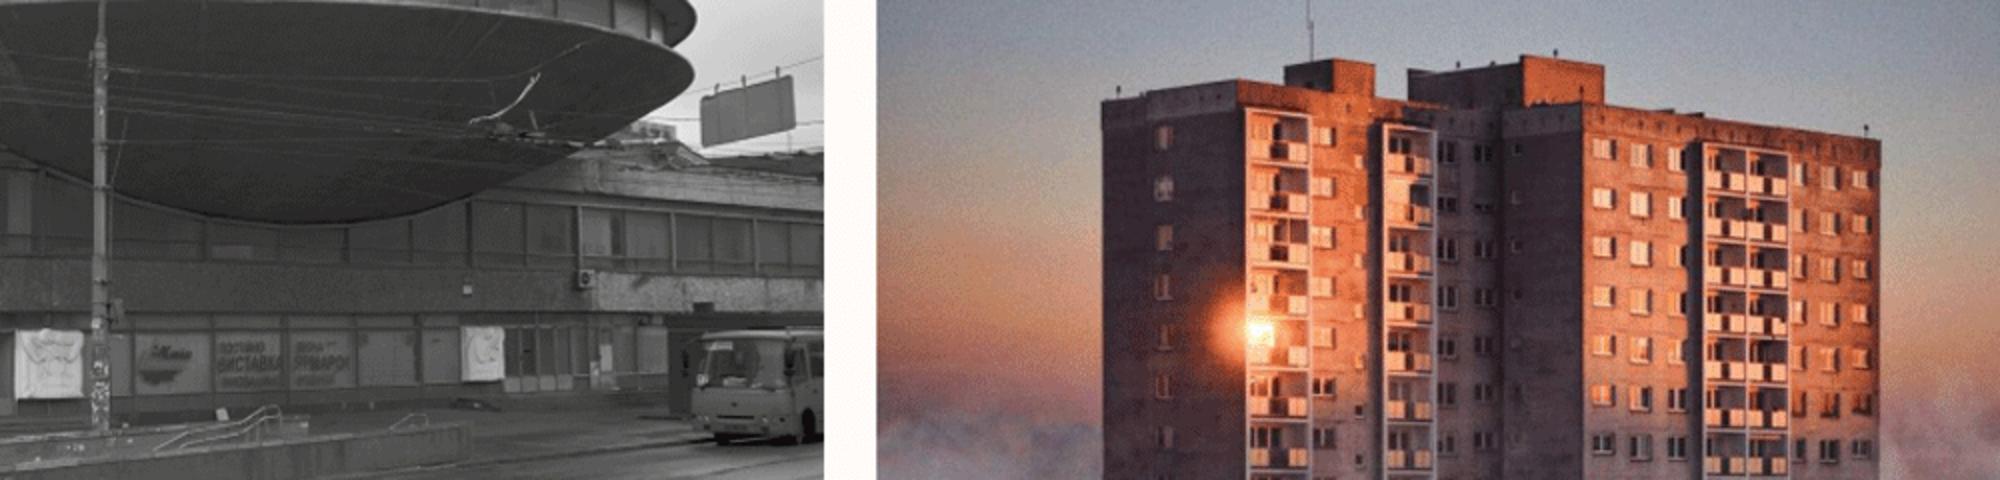 Post-soviet-visionspatrick-bienert-max-von-gumppenberg-jedrezej-frenek